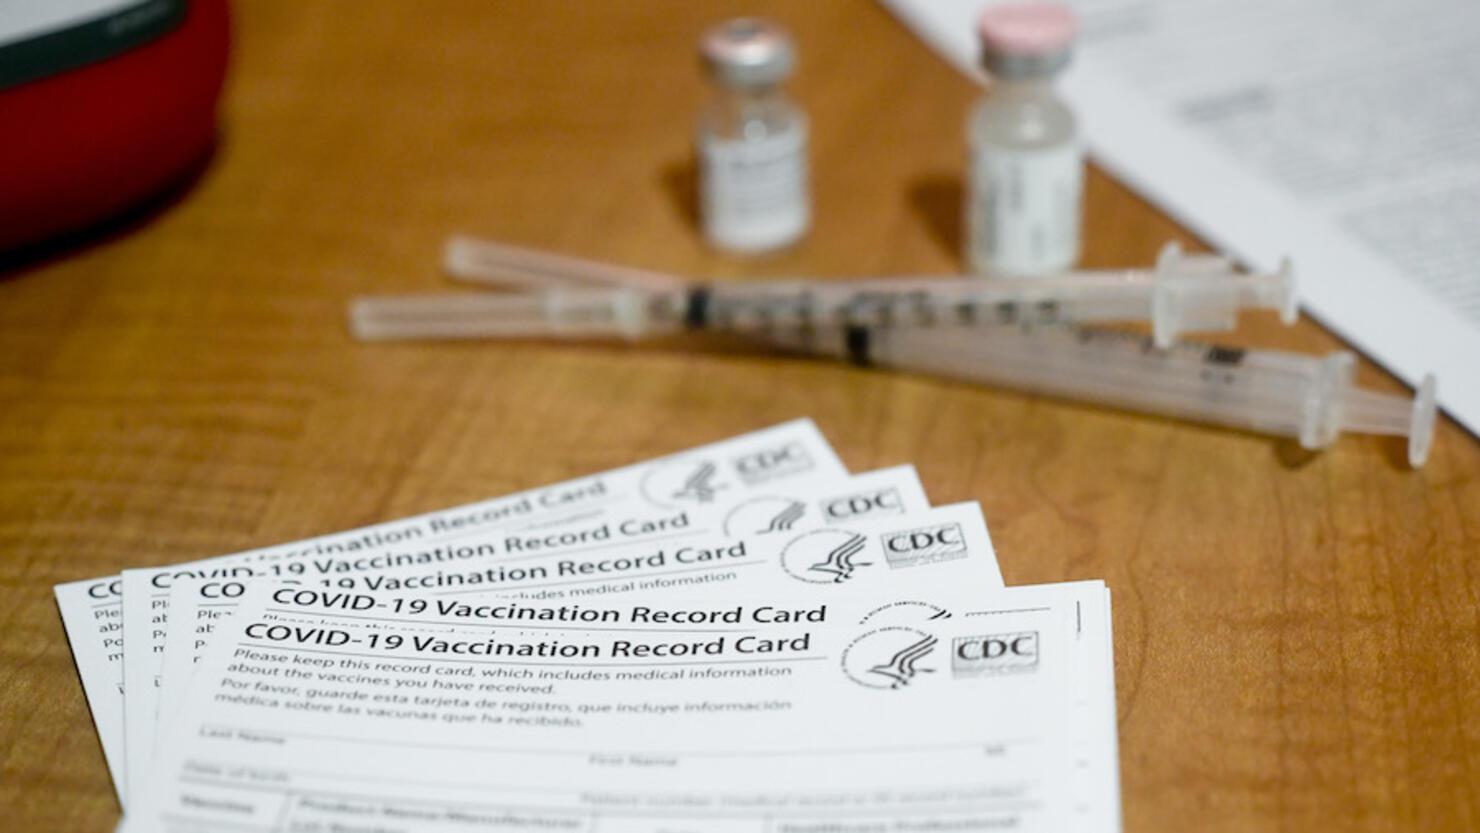 COVID-19 Vaccine At Nursing Home In Pennsylvania